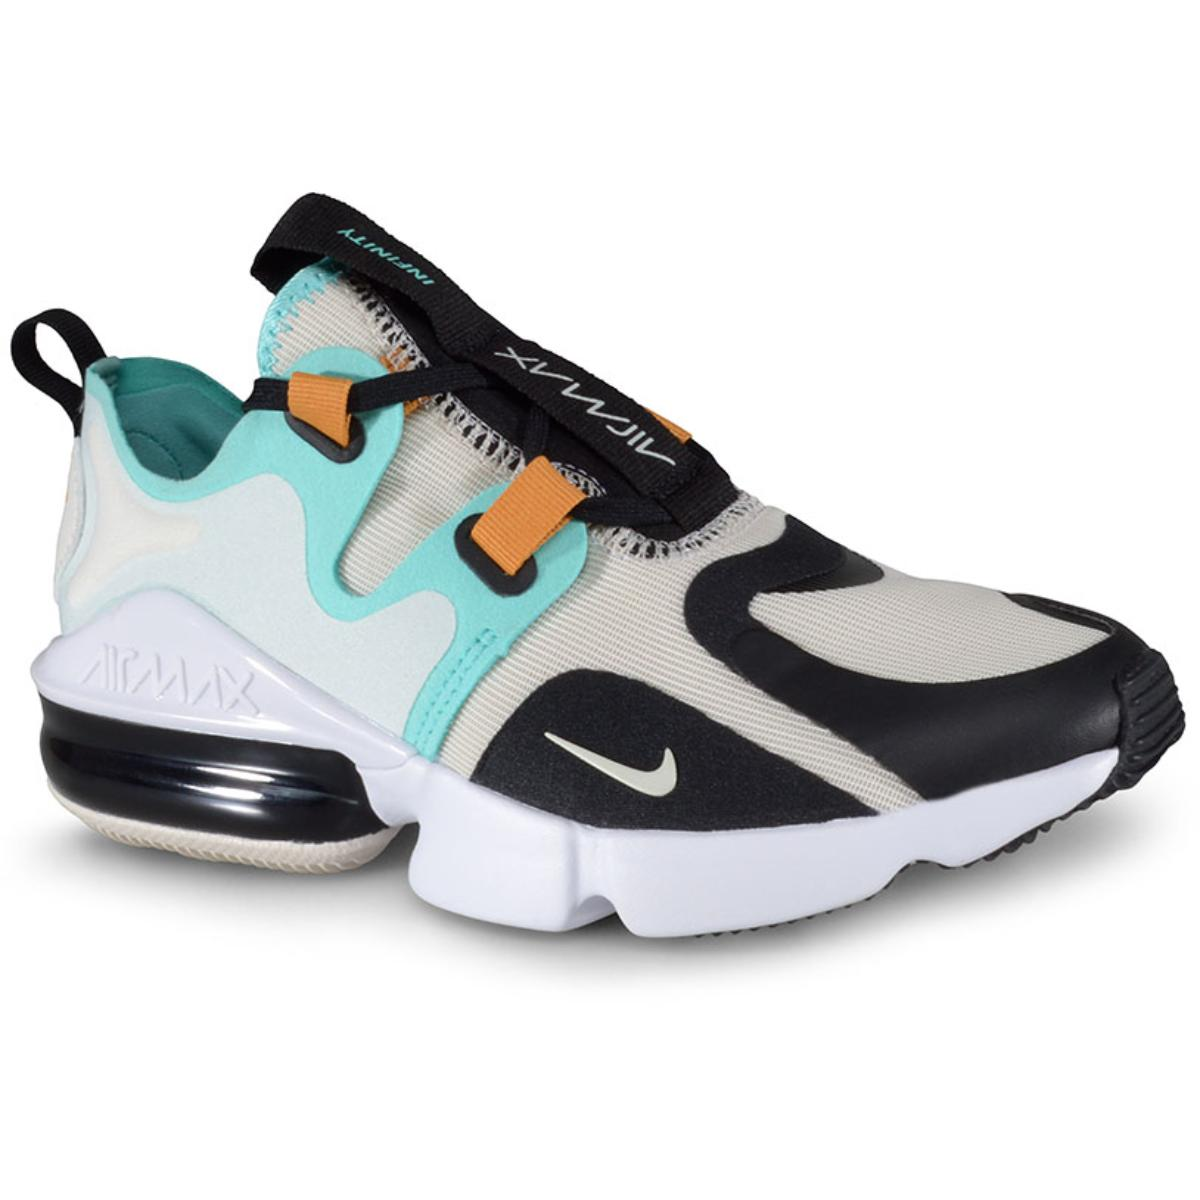 Tênis Feminino Nike Bq4284-002 Wmns Air Max Infinity Bege/verde